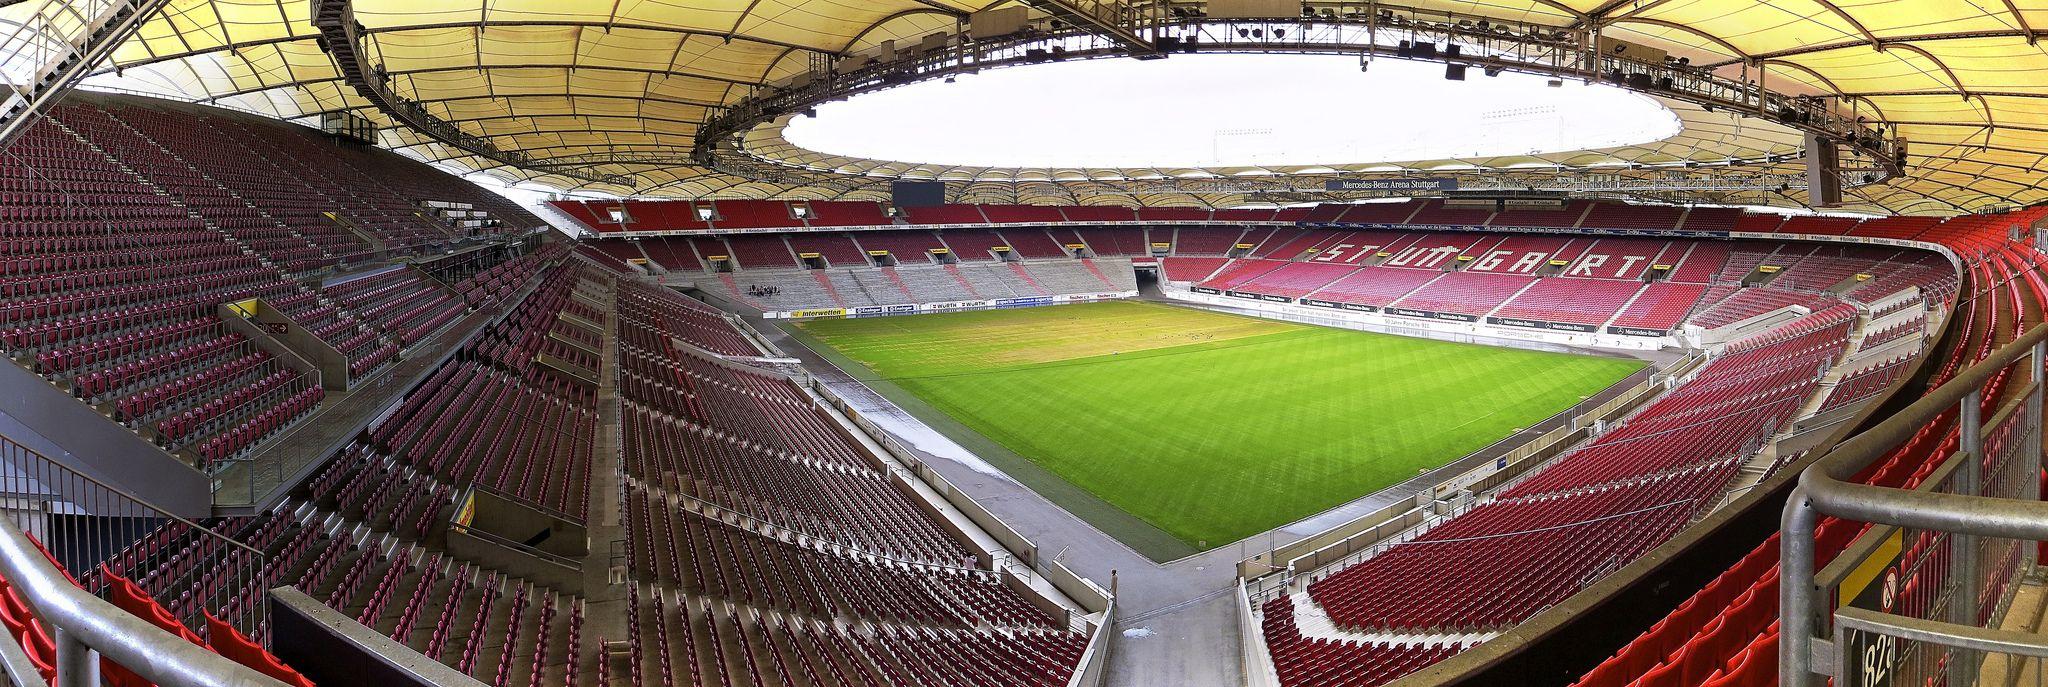 Stuttgart Gegen Bayern Tickets